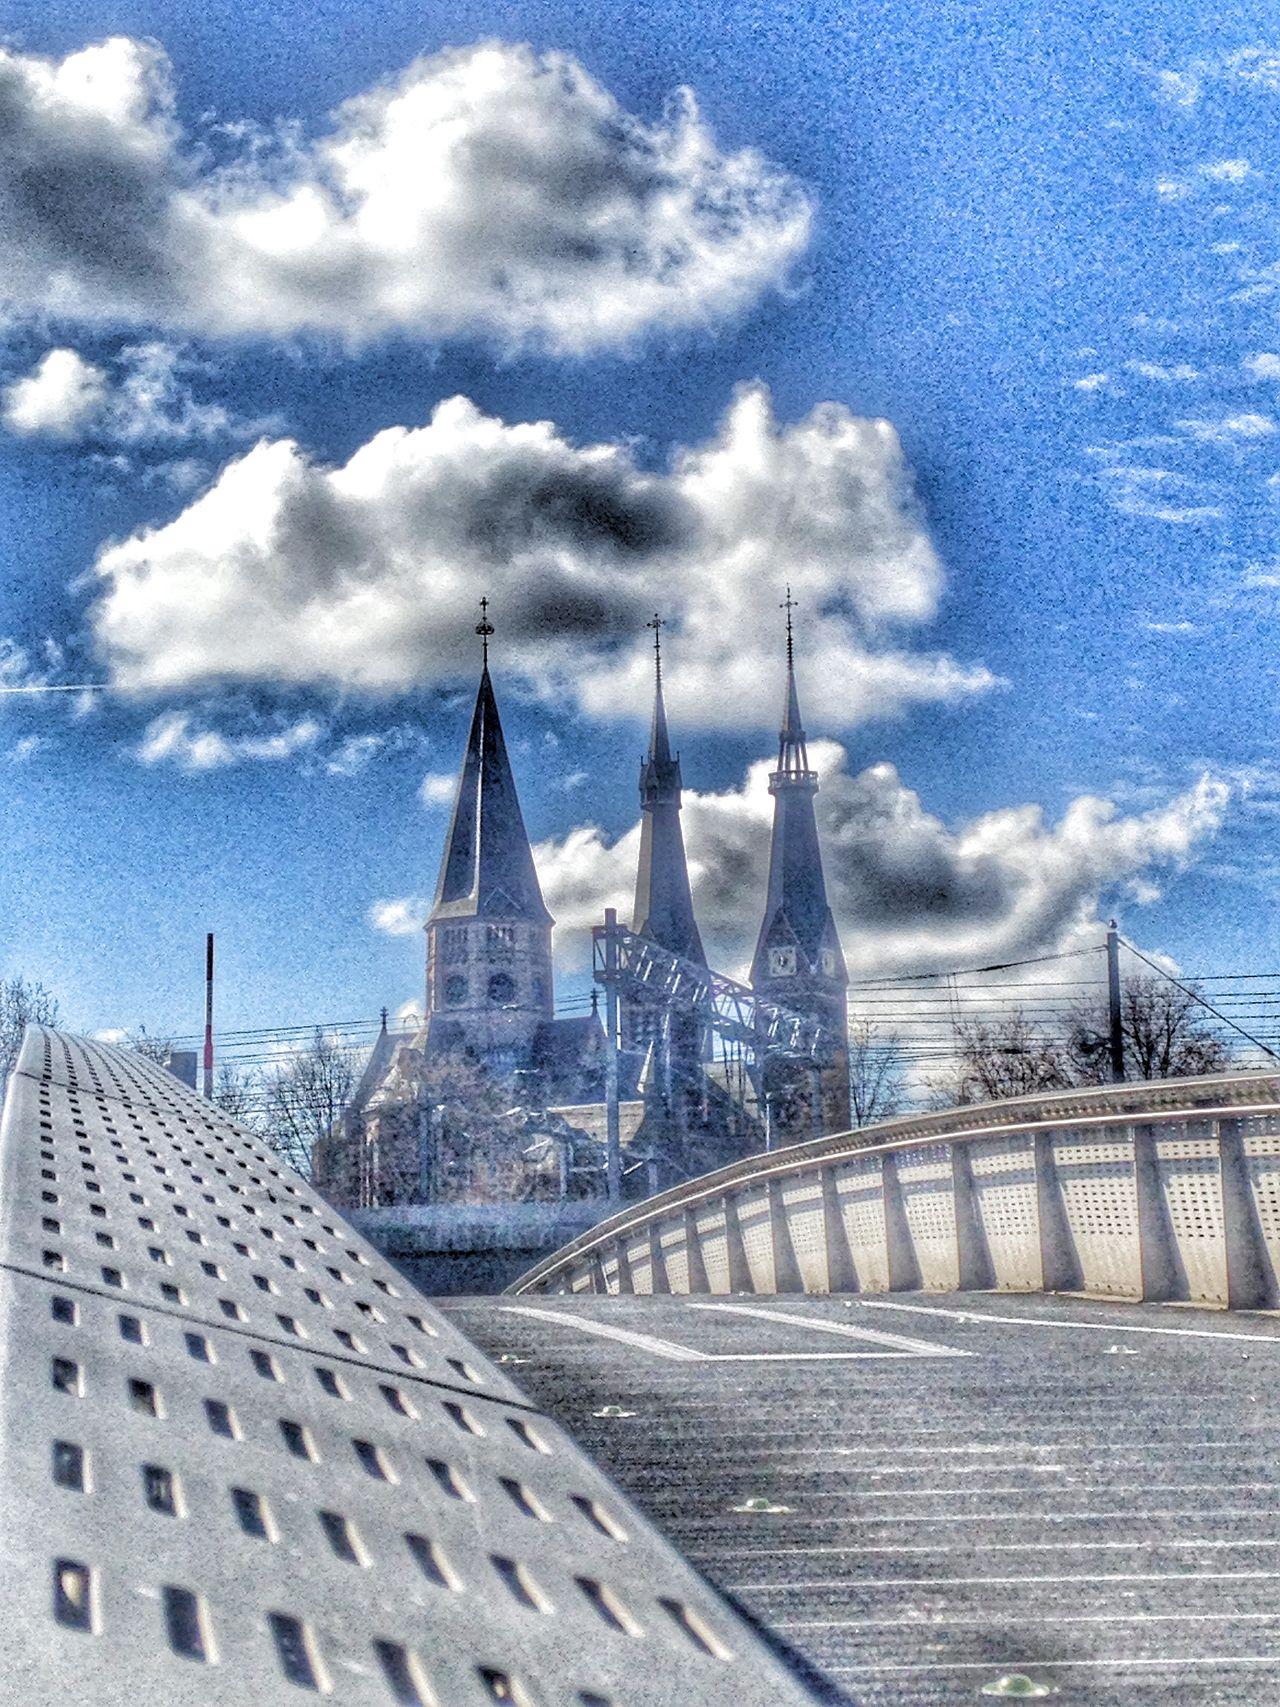 Posthoornkerk Church Posthoornkerk Amsterdam Amsterdamcity Amsterdam City Cloud - Sky Built Structure